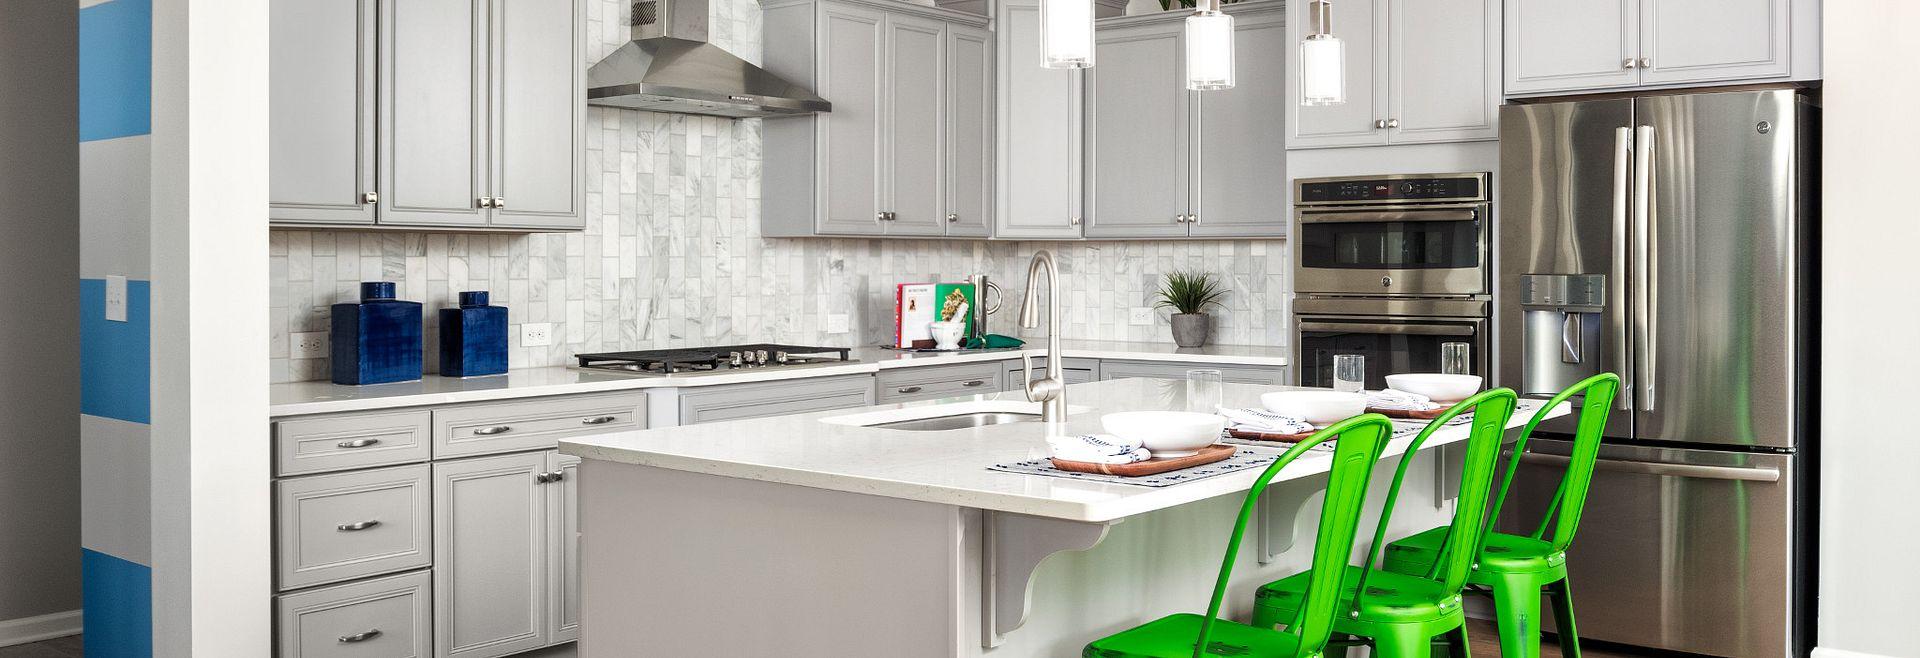 Delaney plan Kitchen with split cooking